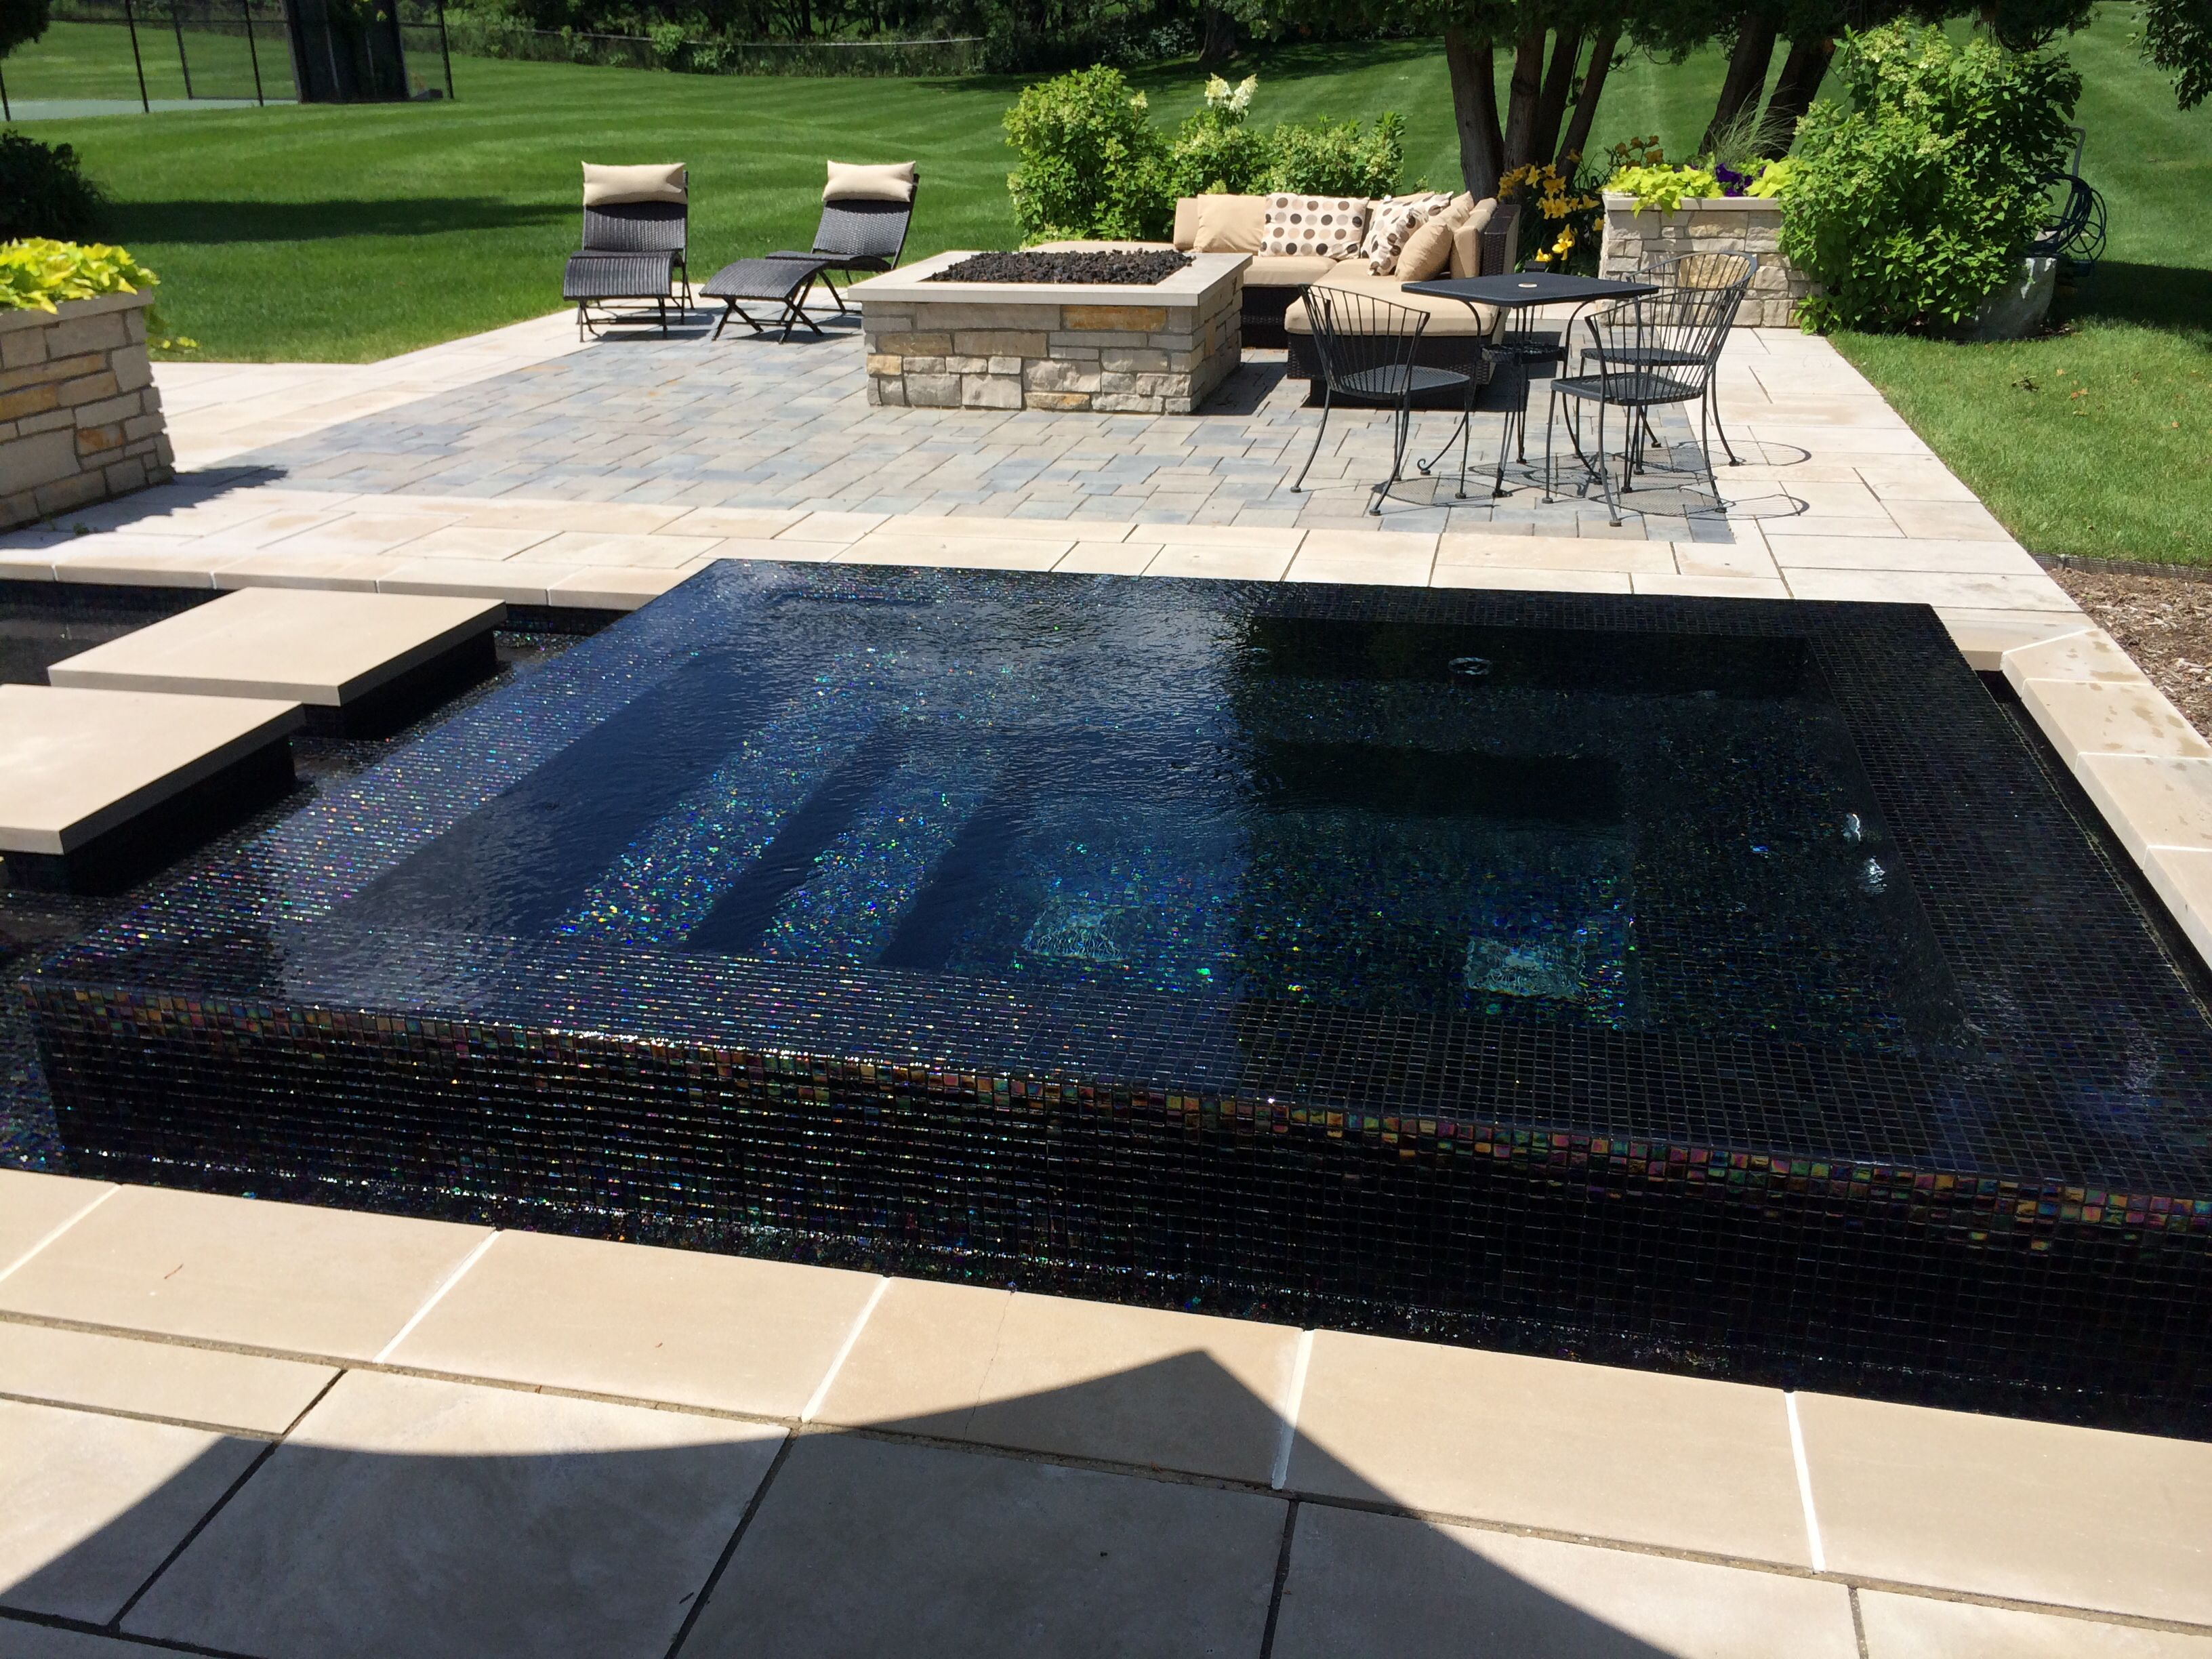 Perimeter Overflow Glass Tile Spa By Www Apexlandscapemi Com Backyard Pool Designs Swimming Pool Designs Pool Designs